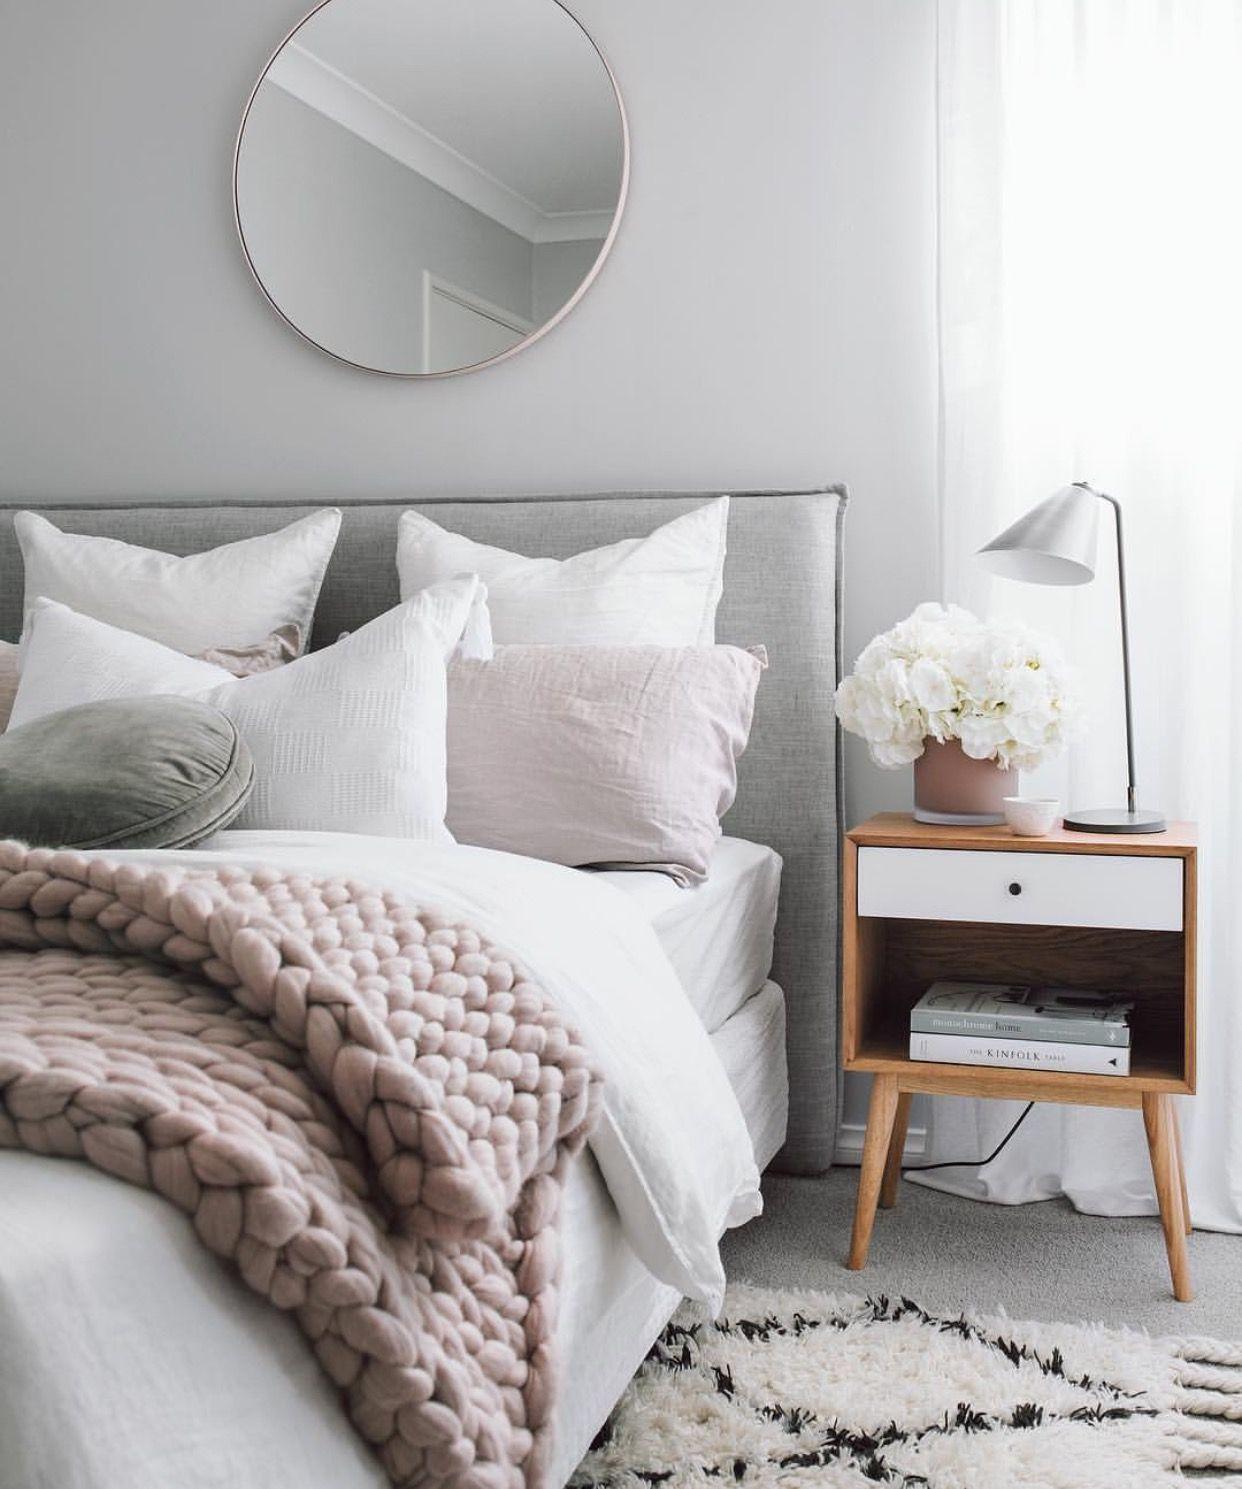 Pinterest sofia c l h o m e decoraci n de unas for Ejemplo de dormitorio deco